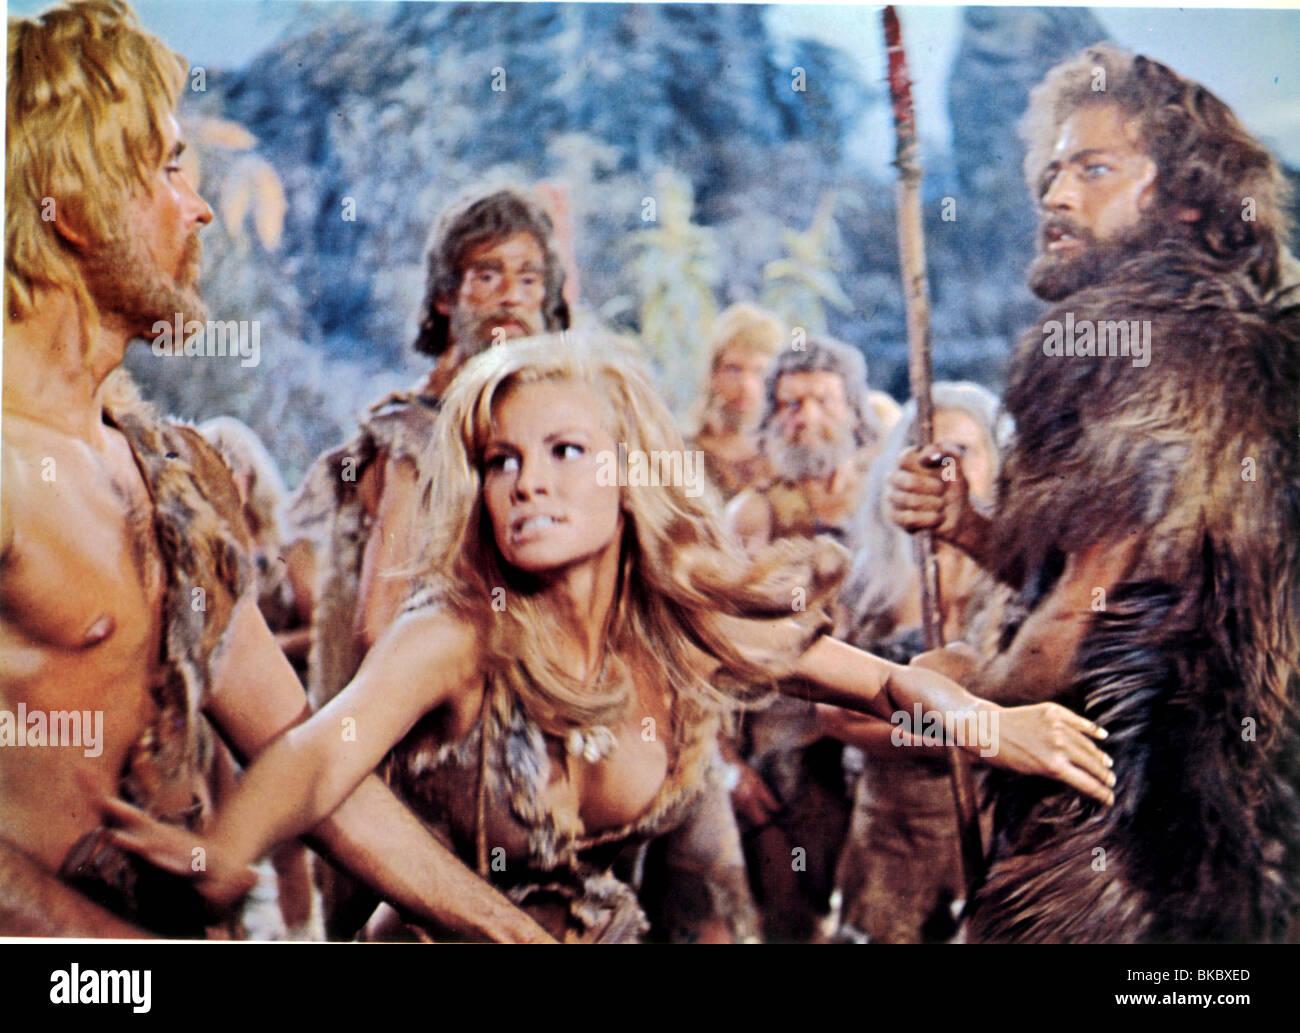 ONE MILLION YEARS BC RAQUEL WELCH,JOHN RICHARDSON - Stock Image